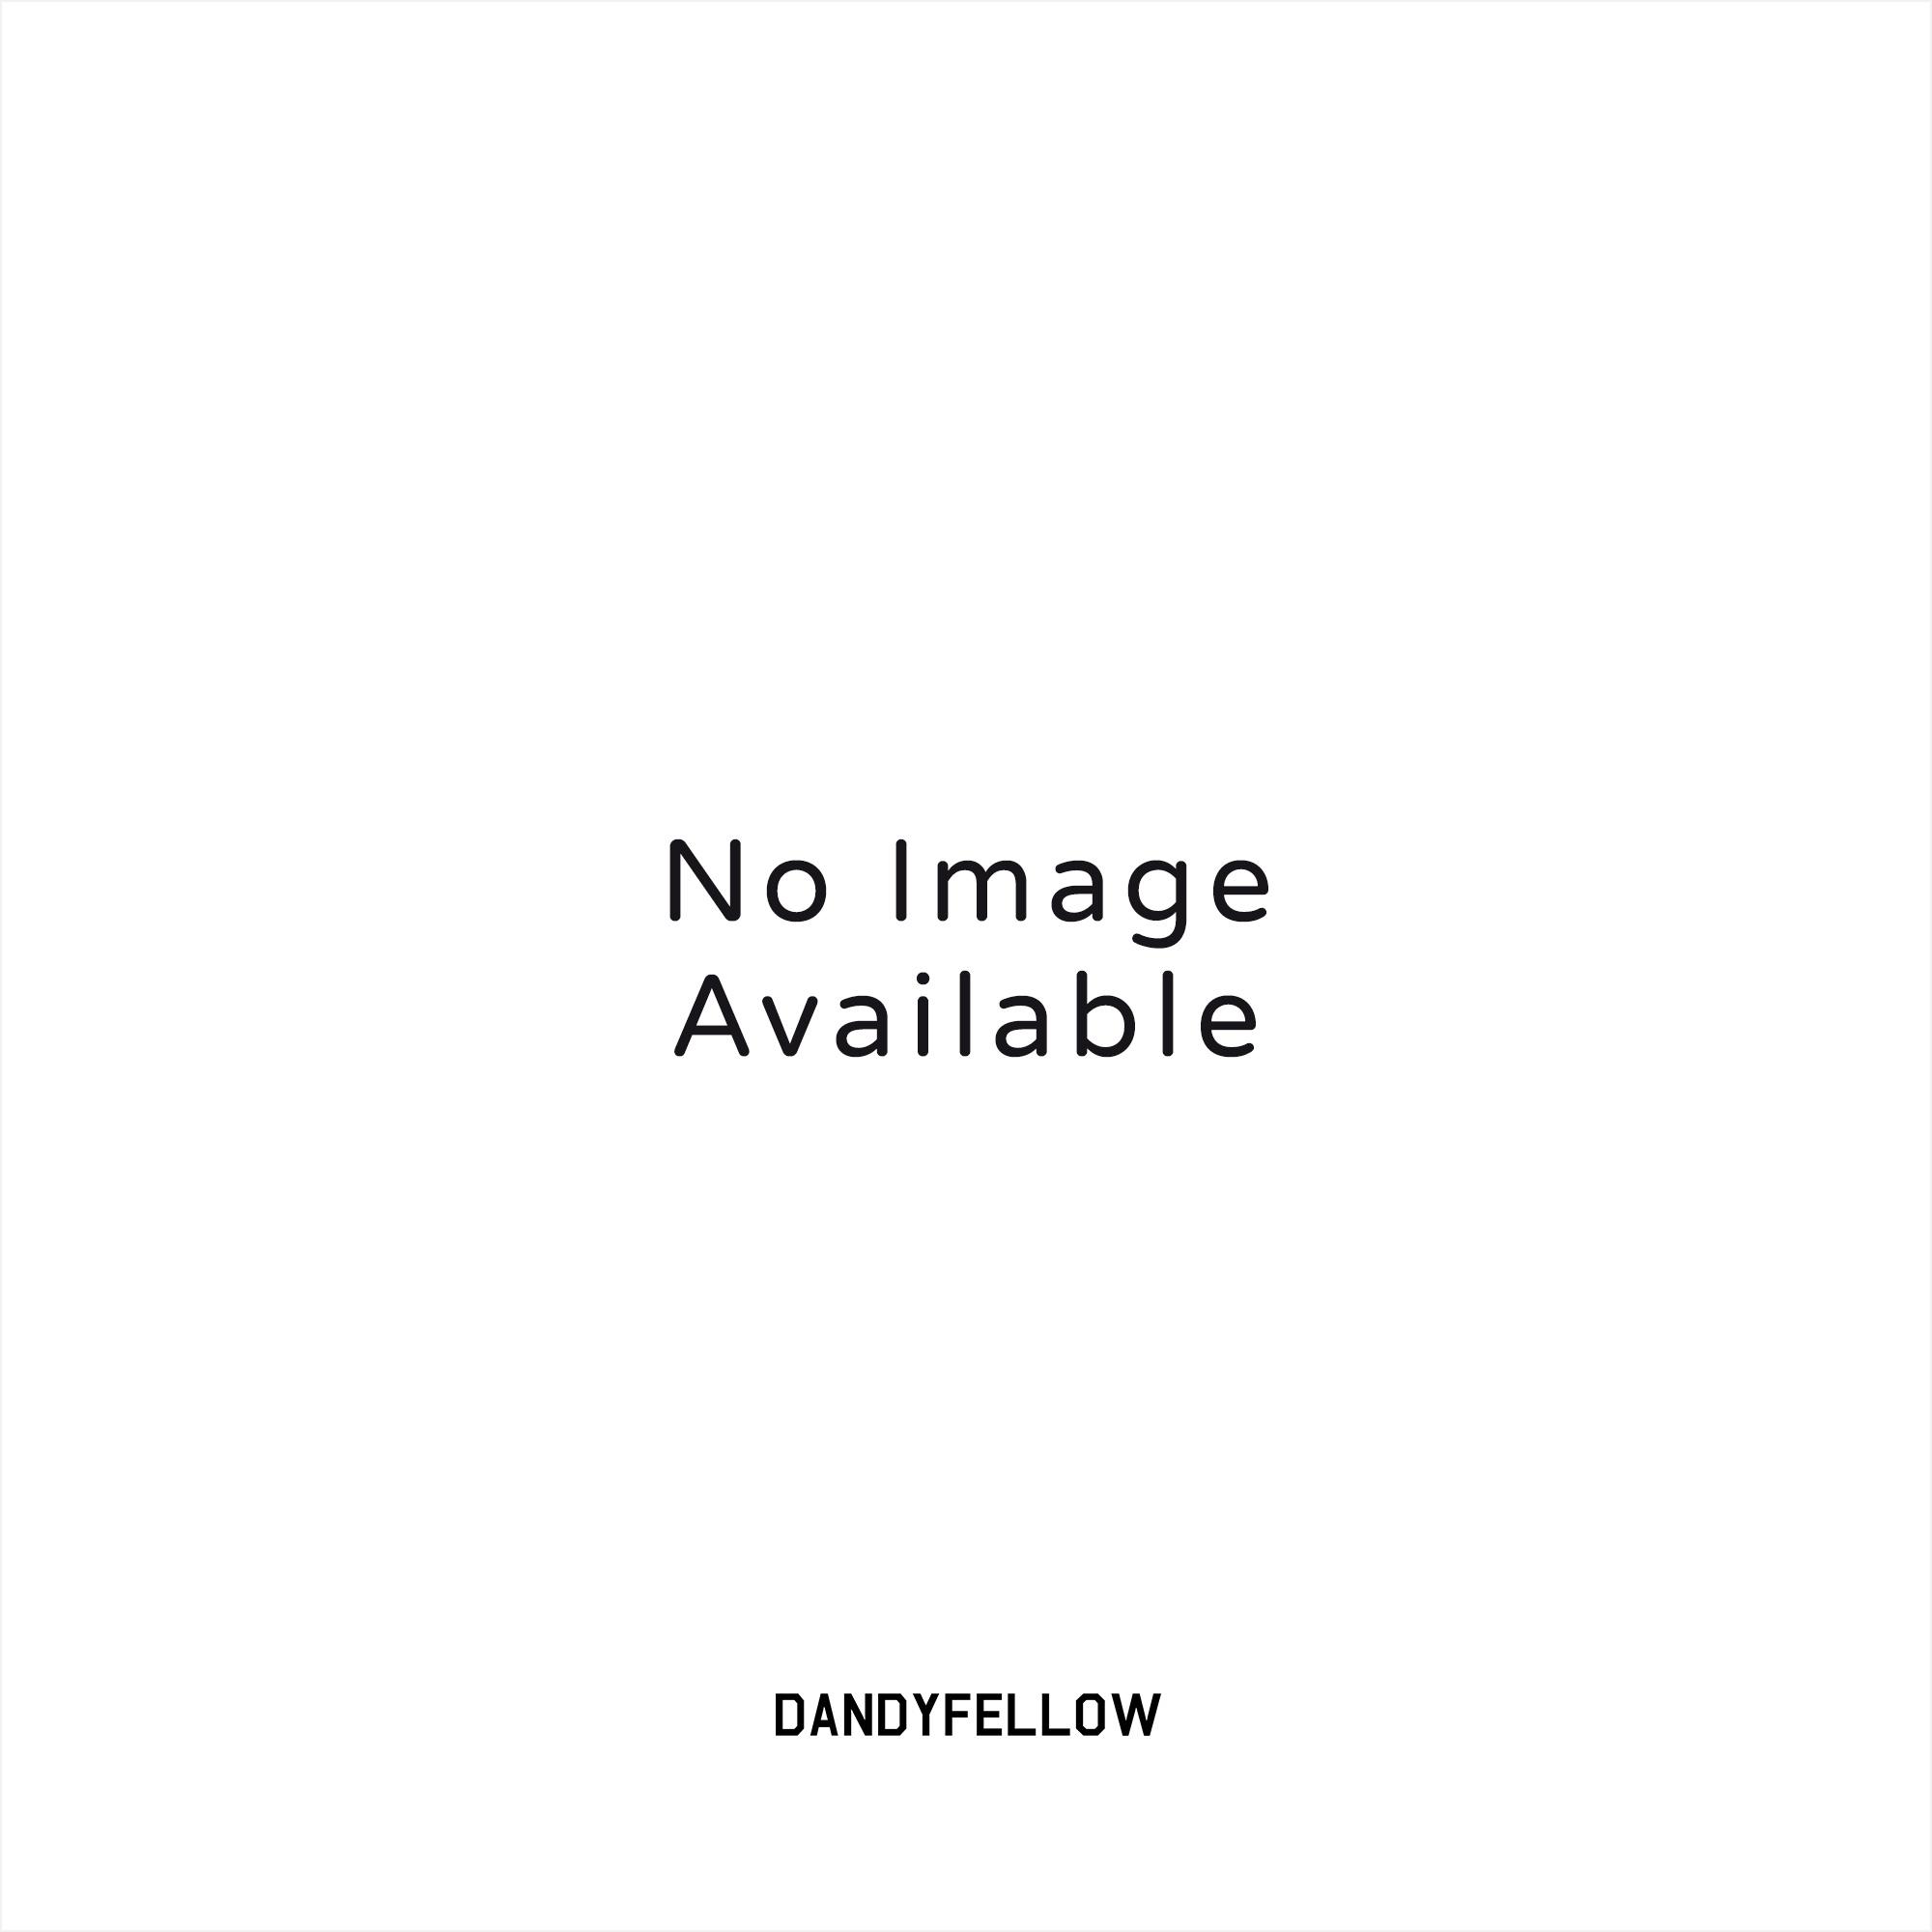 Paul Smith Merino Wool Charcoal Jumper PRXD-991P-220